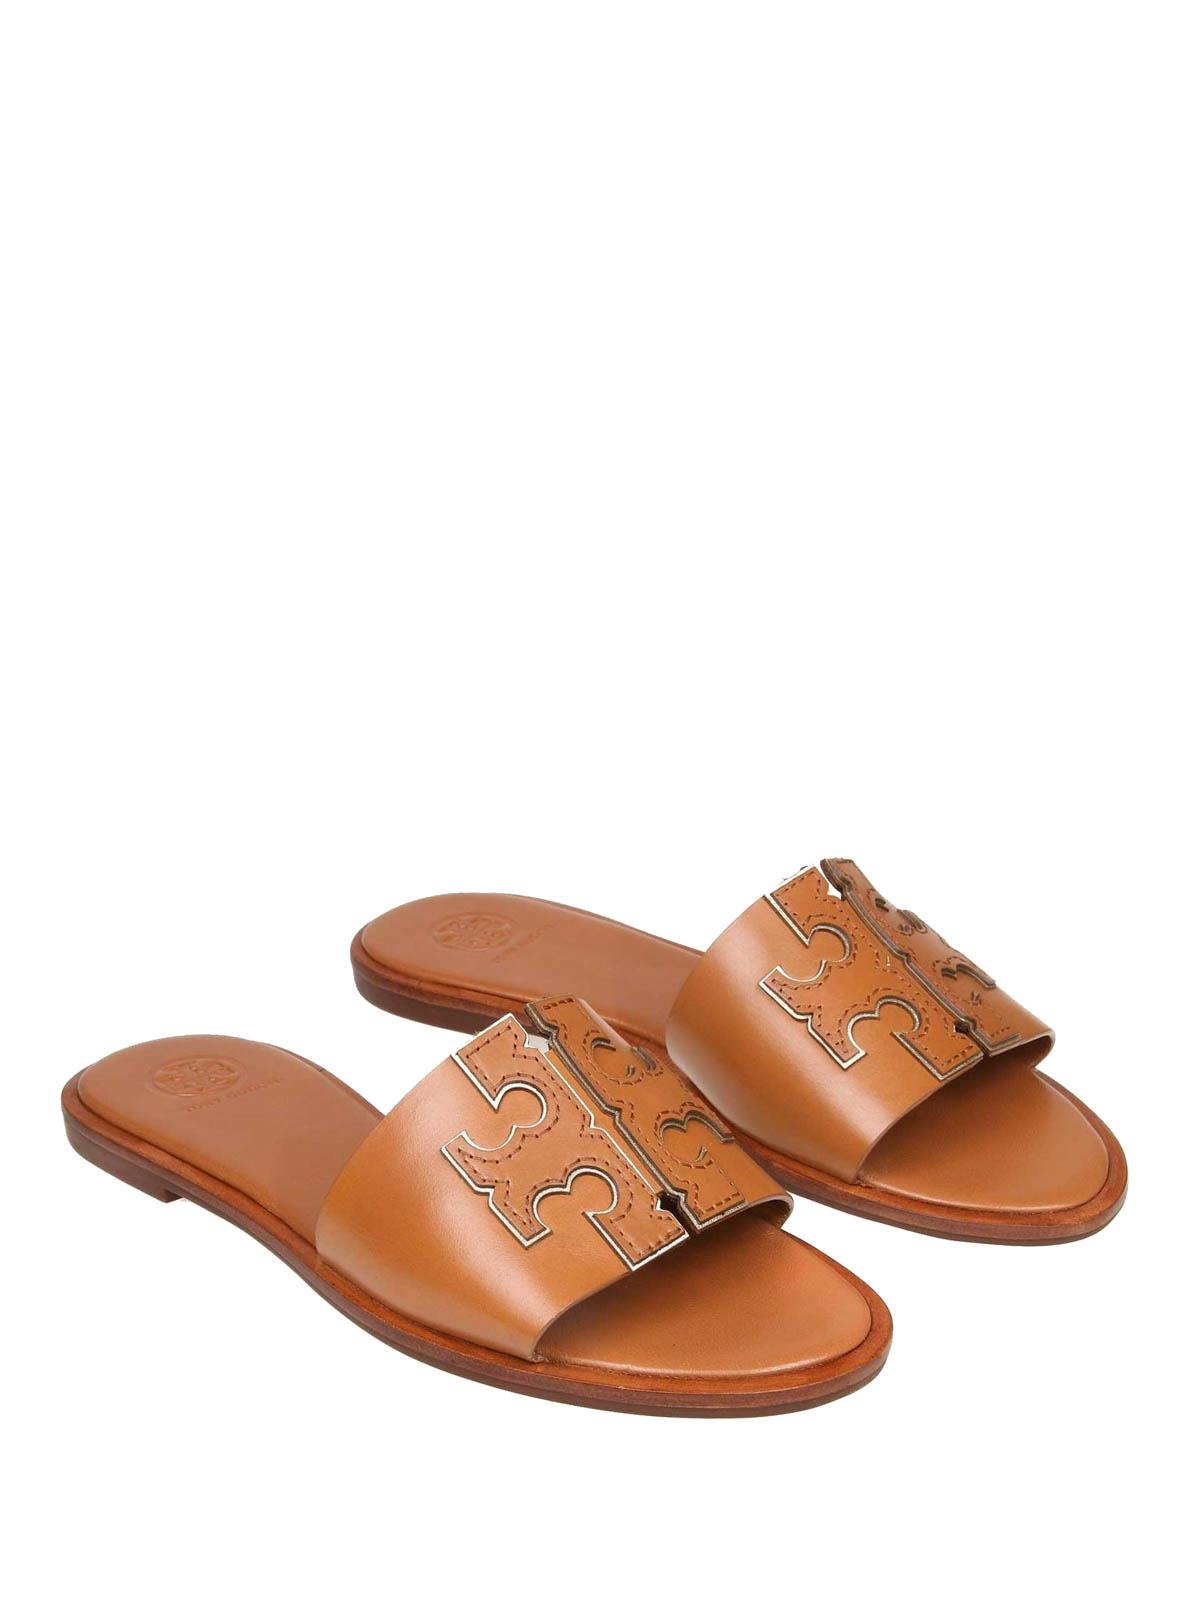 6d31e0f90056 Tory Burch - Ines leather slide sandals - sandals - 50109 250 ...